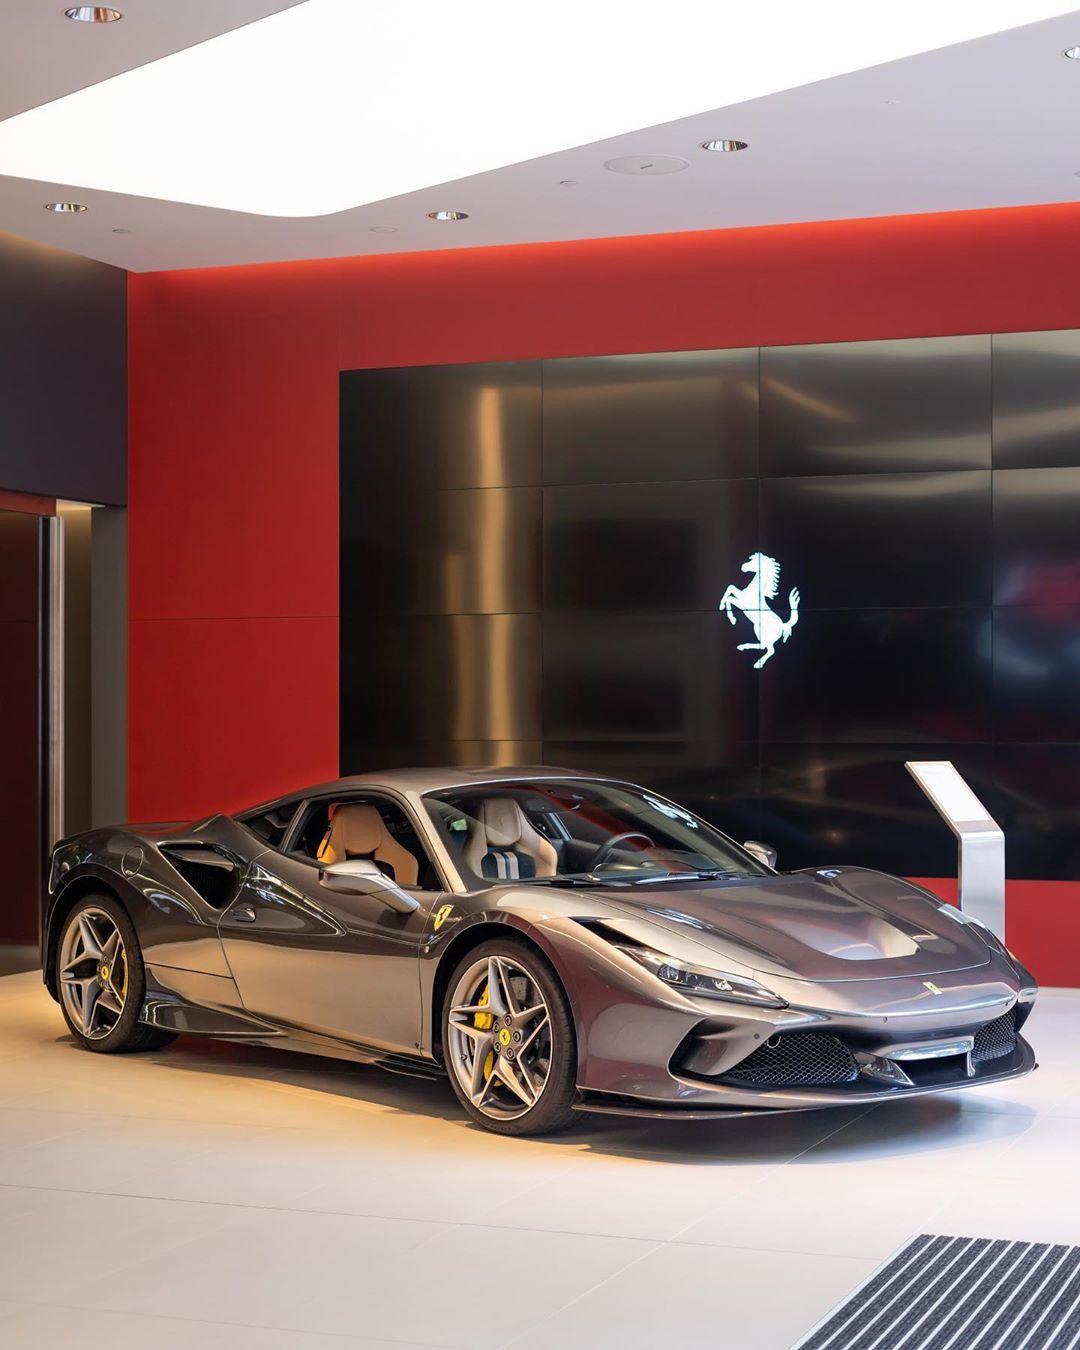 Pin By Jeff Fonville On Ahyper Car Super Luxury Cars Ferrari Showroom Sports Cars Luxury